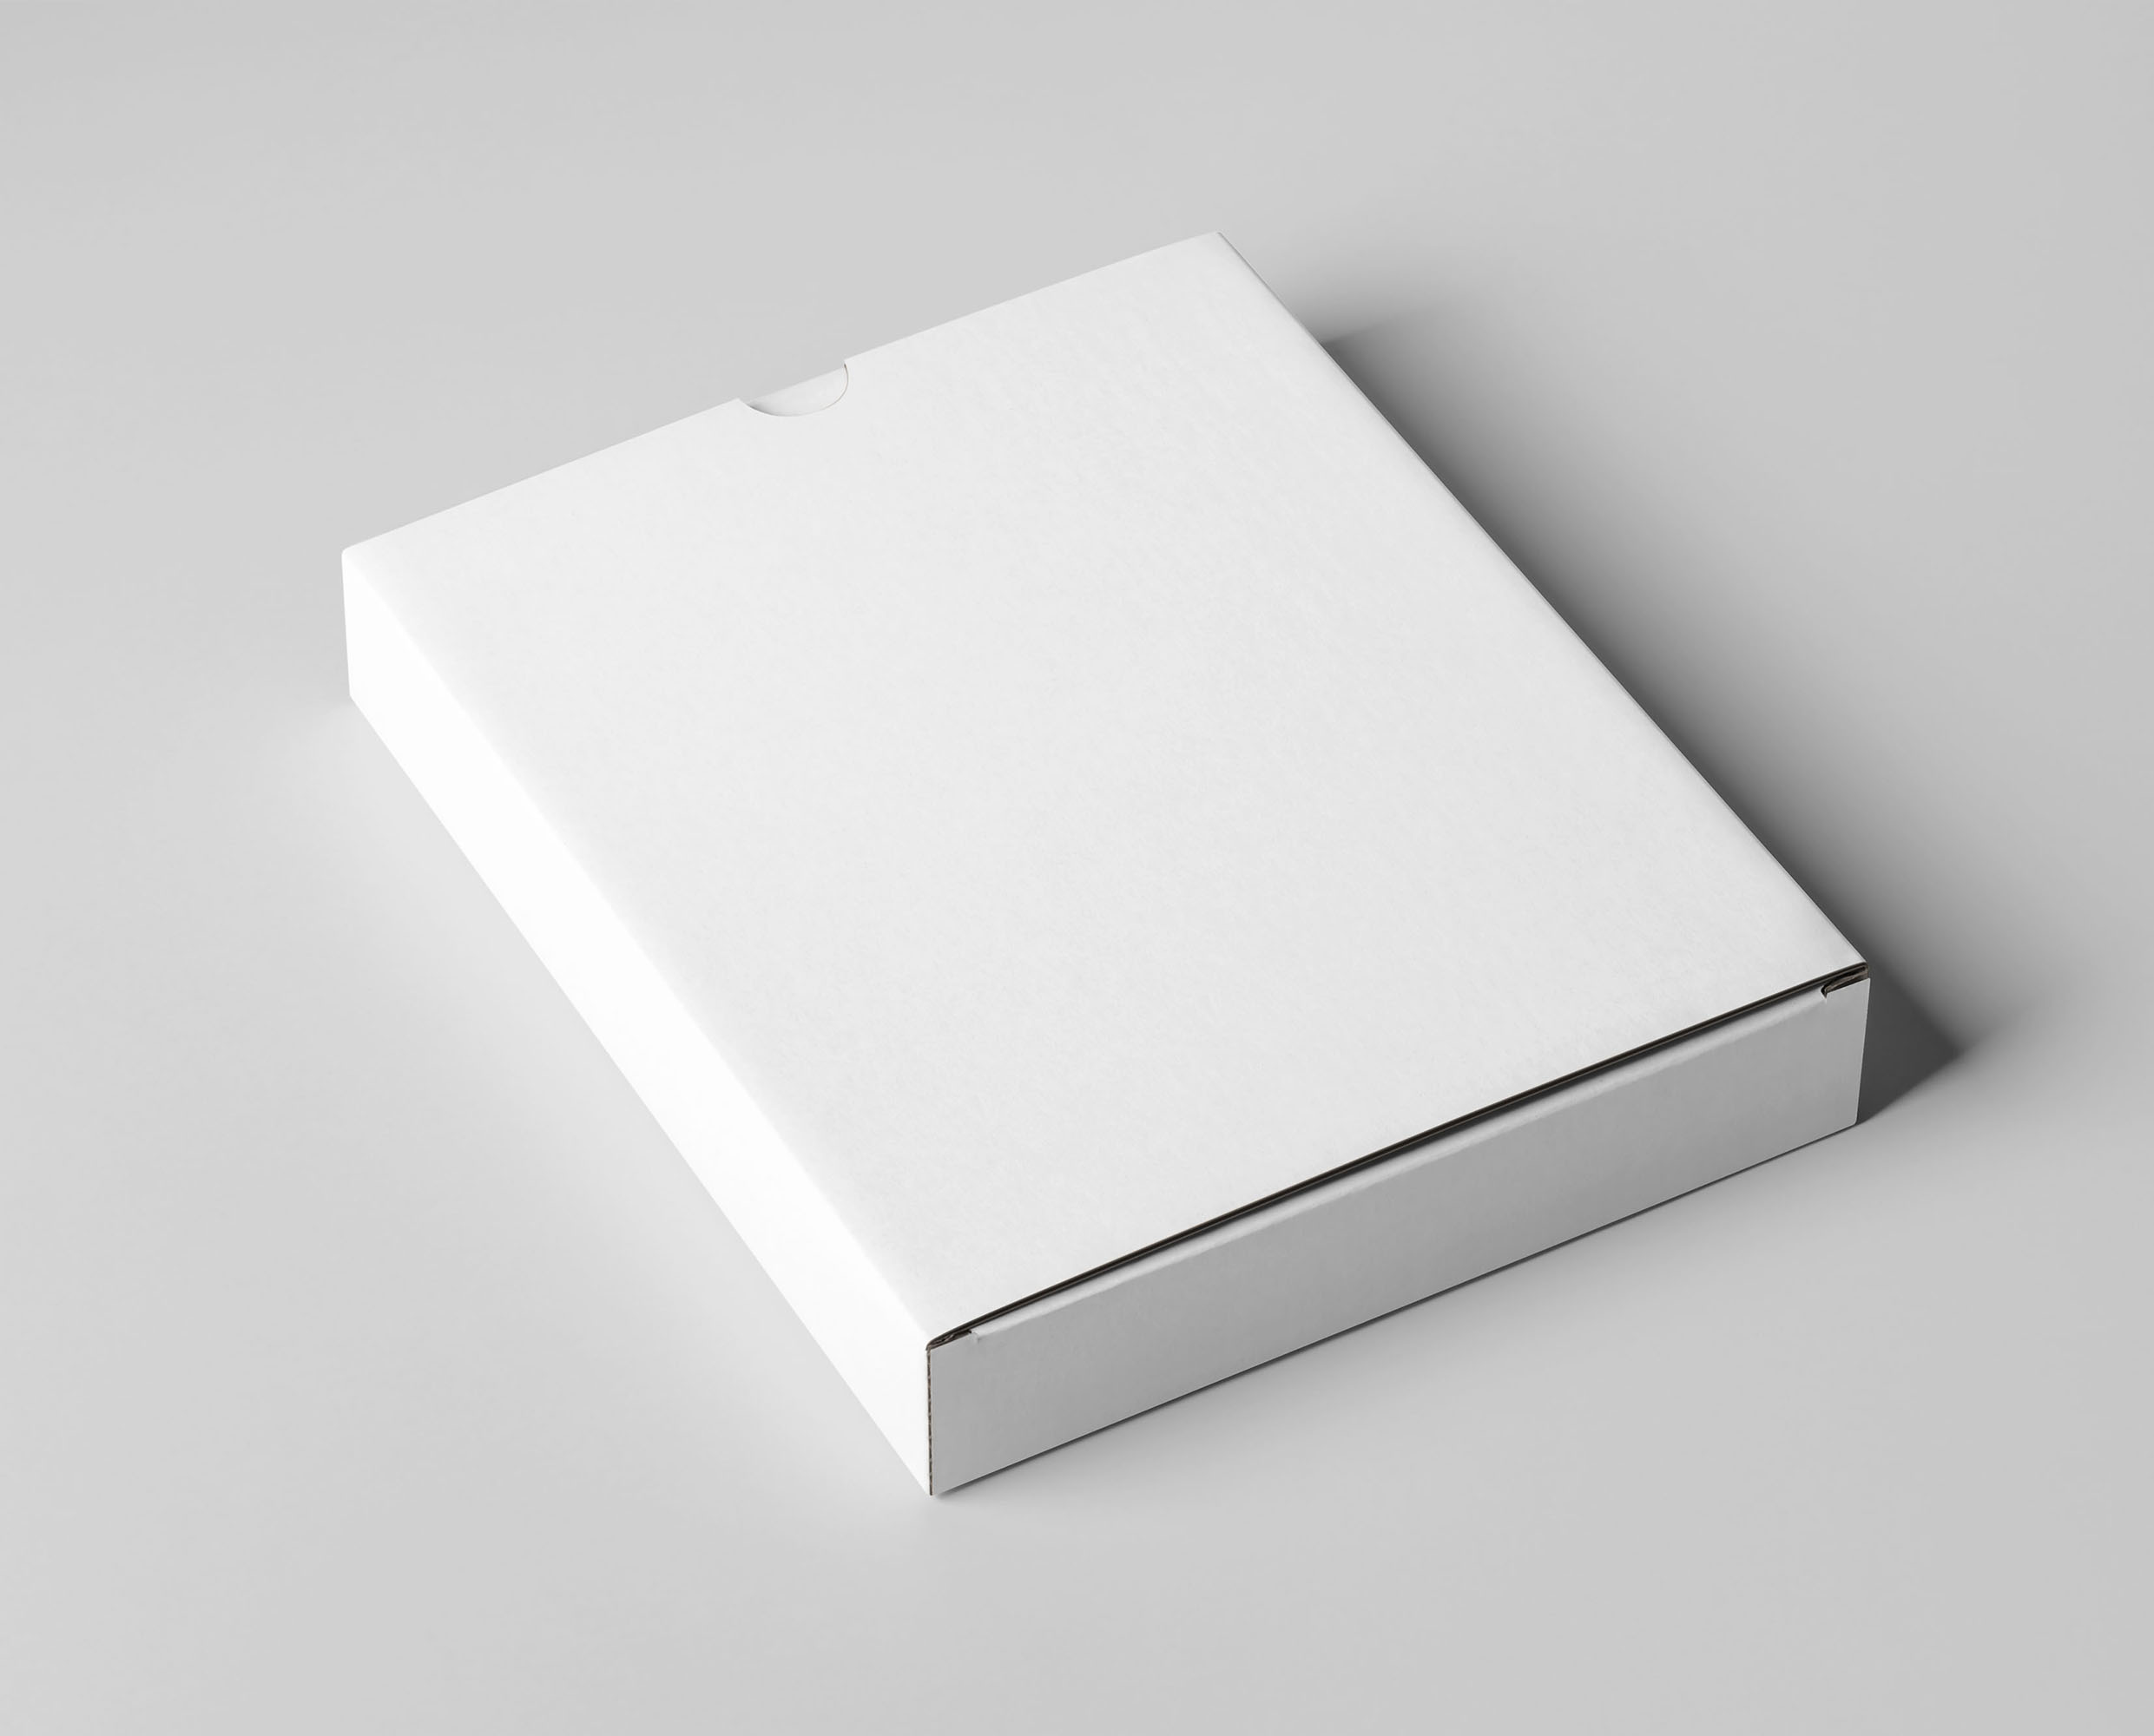 Flat Box Mockup example image 6